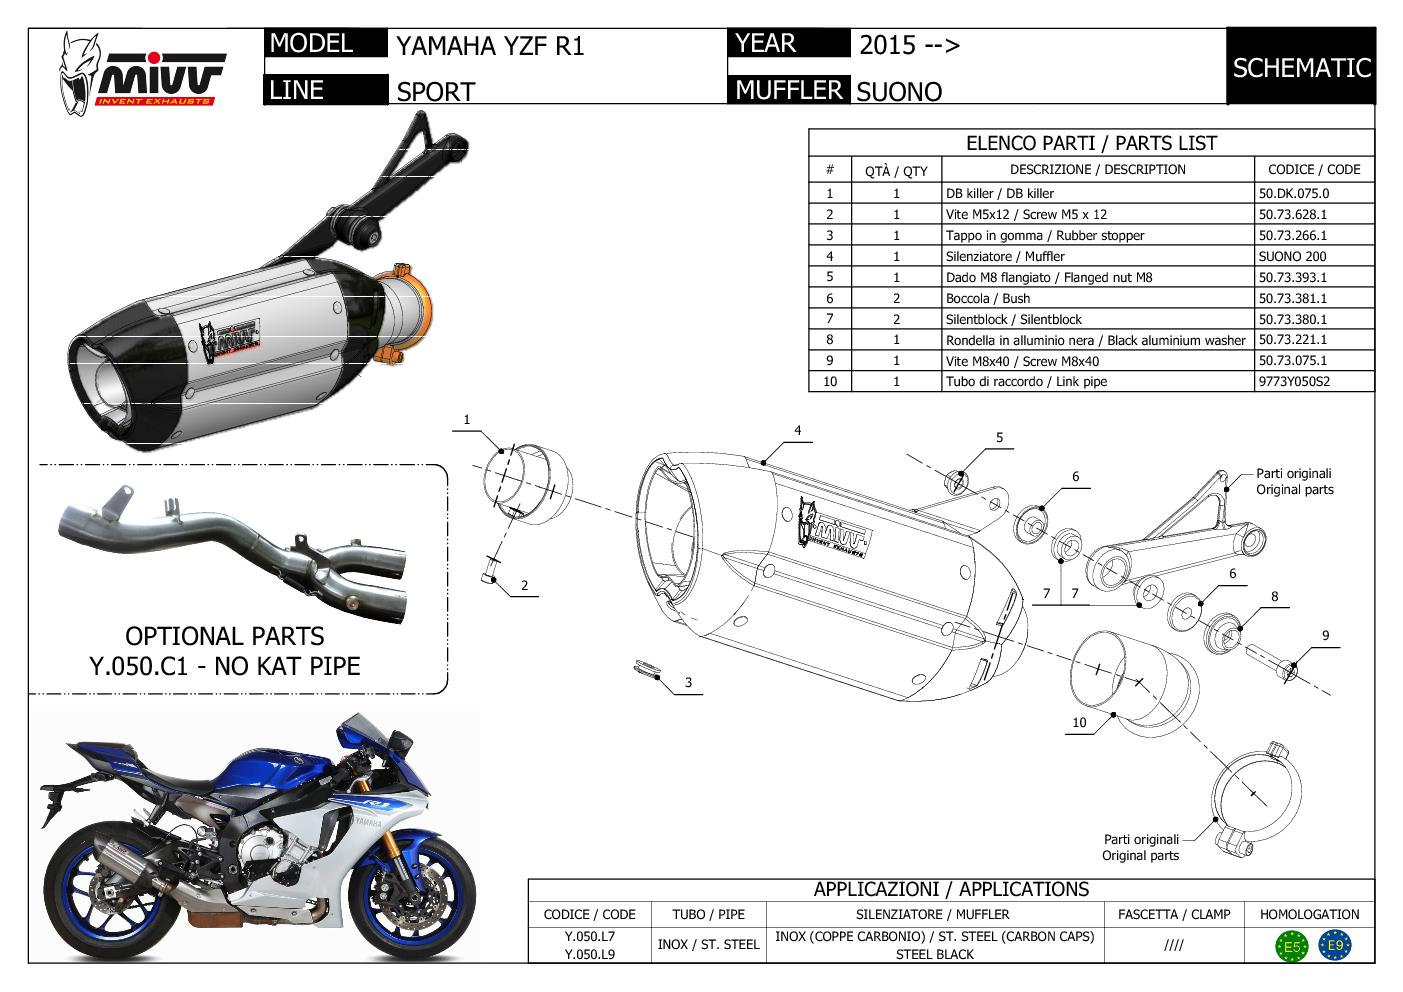 Y.050.L9 Mivv Exhaust Muffler Suono Black Stainless Steel Yamaha Yzf 1000 R1 2015 > 2021